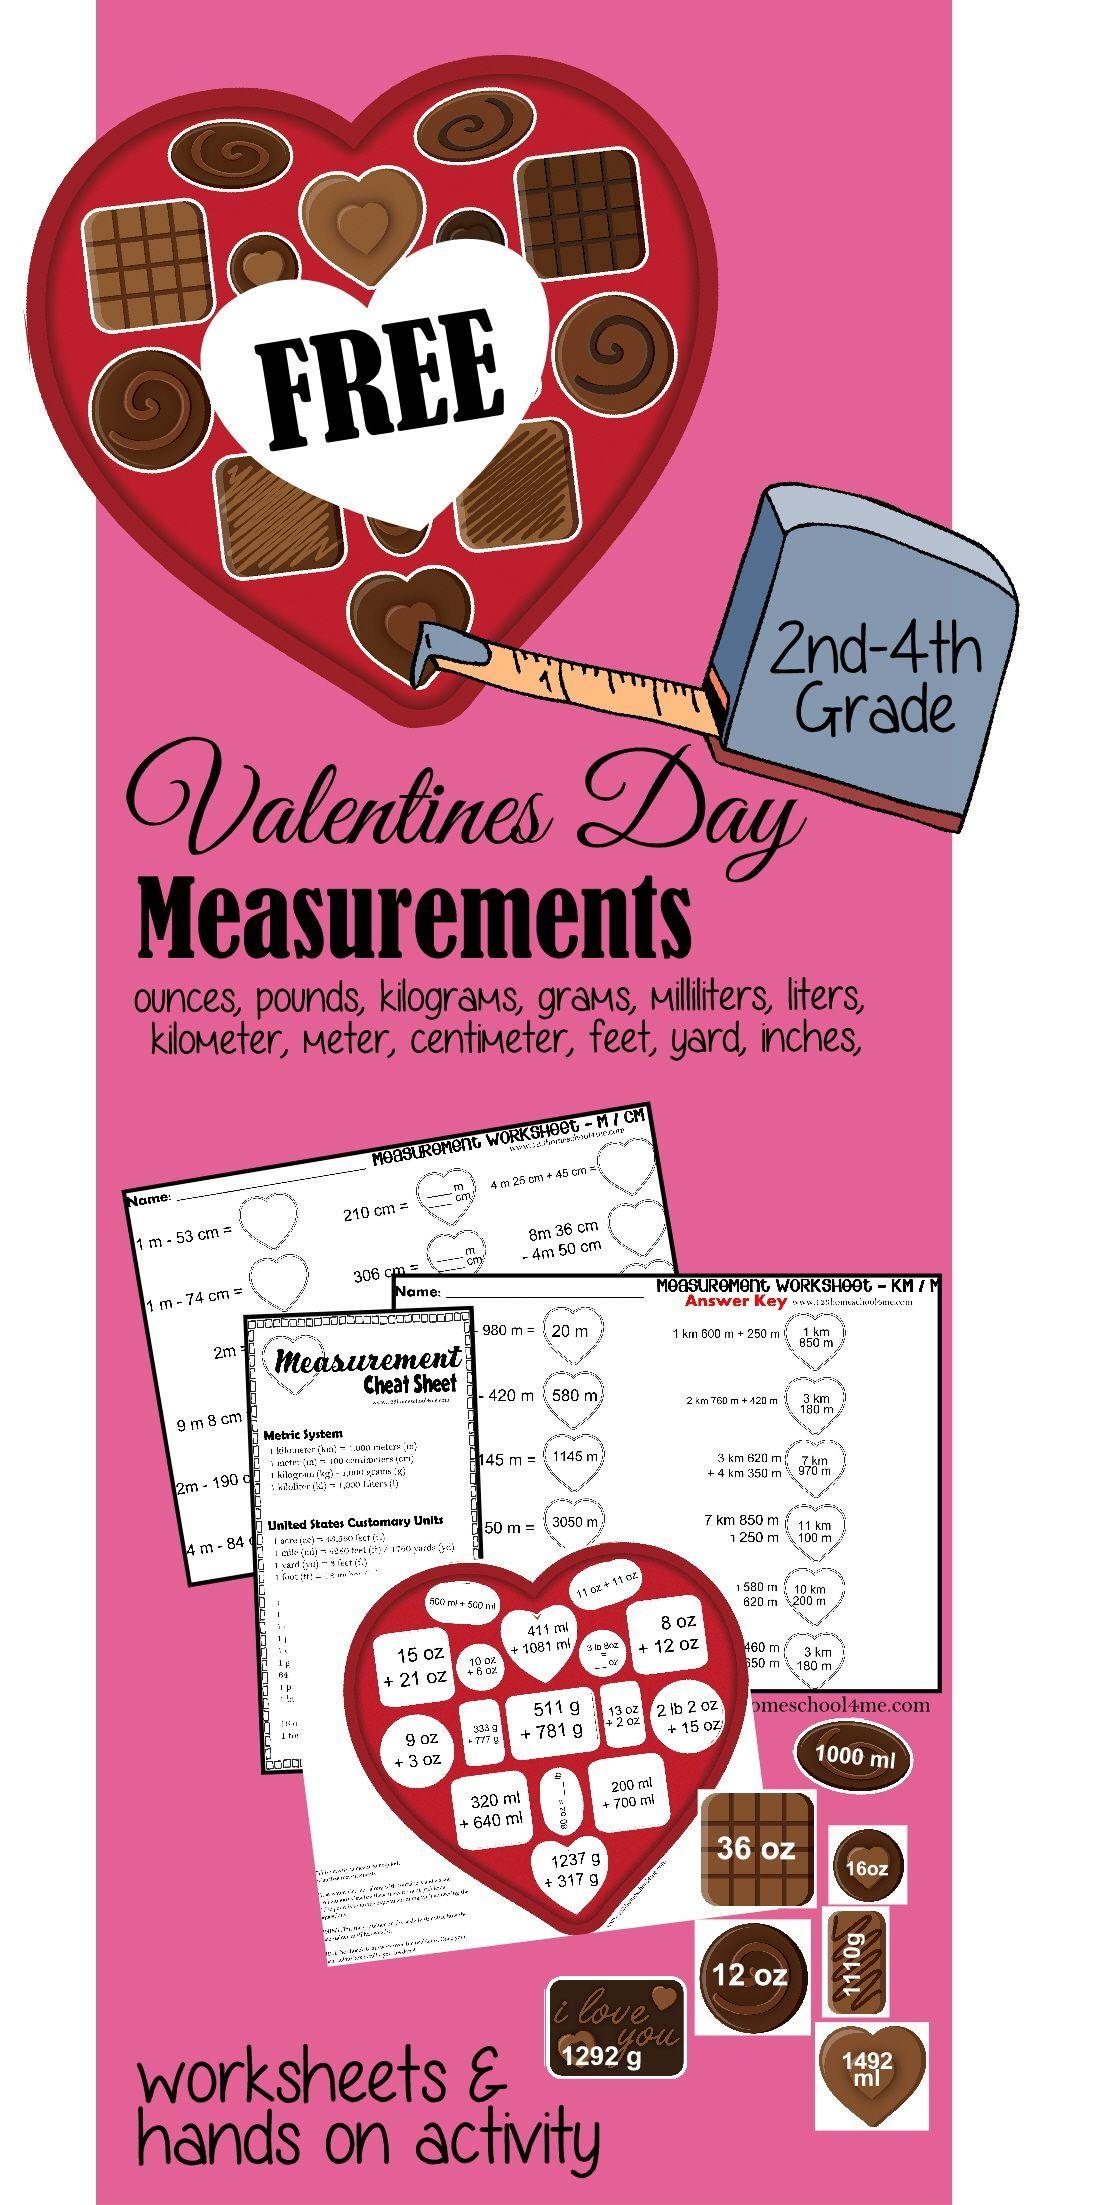 Valentines Day Measurement Worksheets